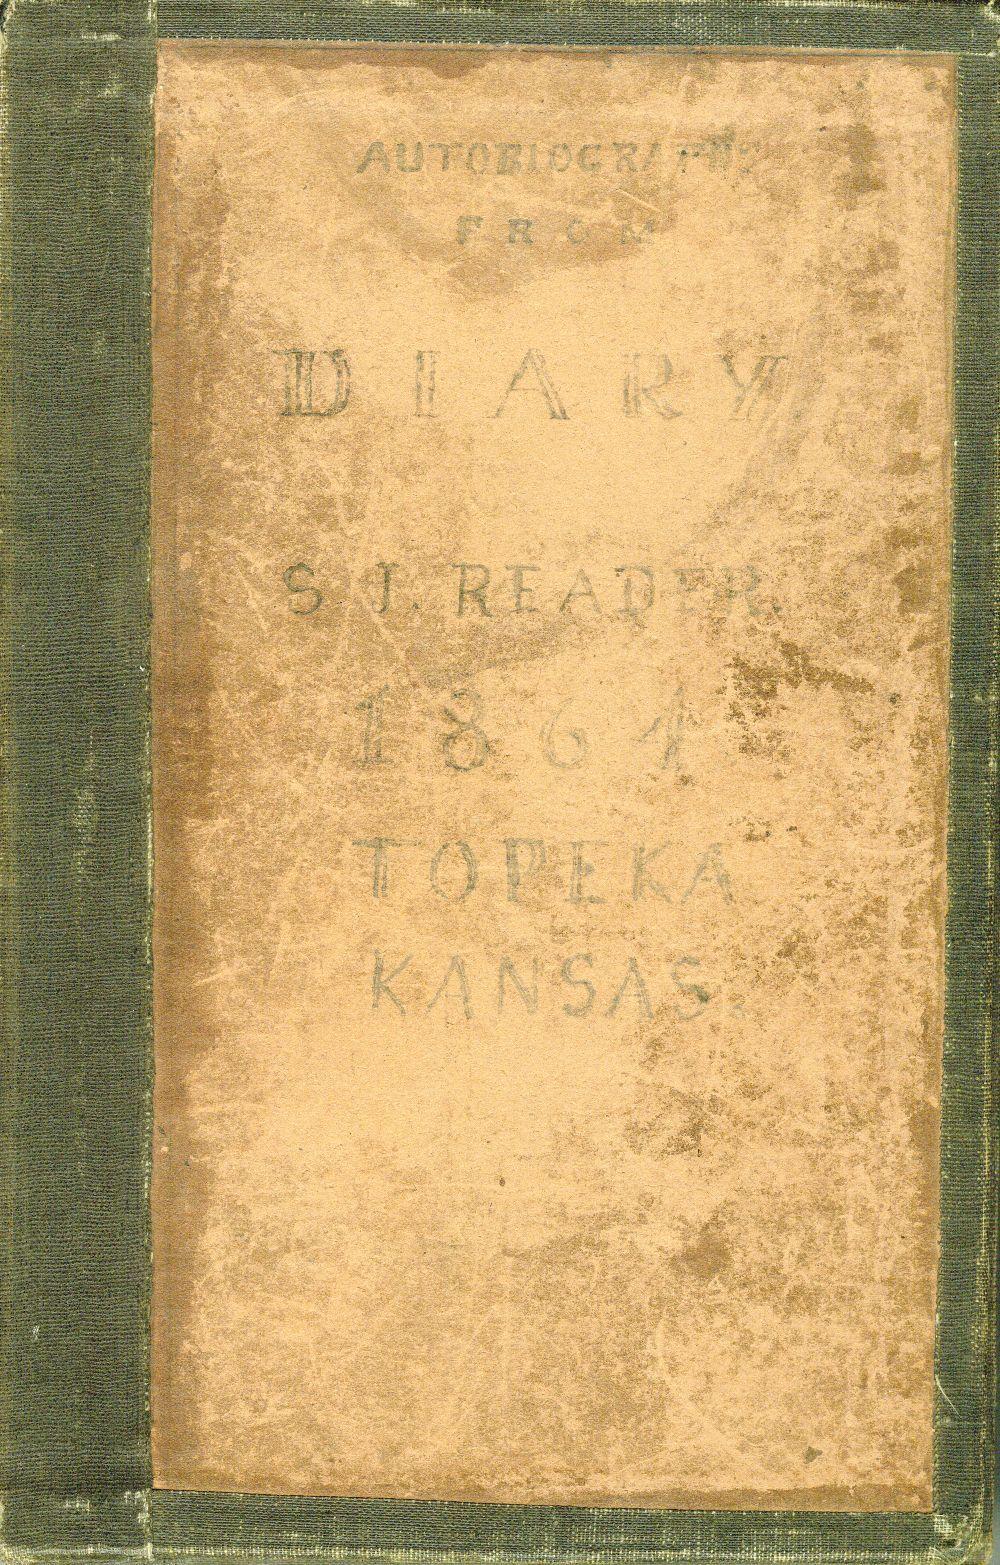 Samuel J. Reader's autobiography, volume 3 - 1